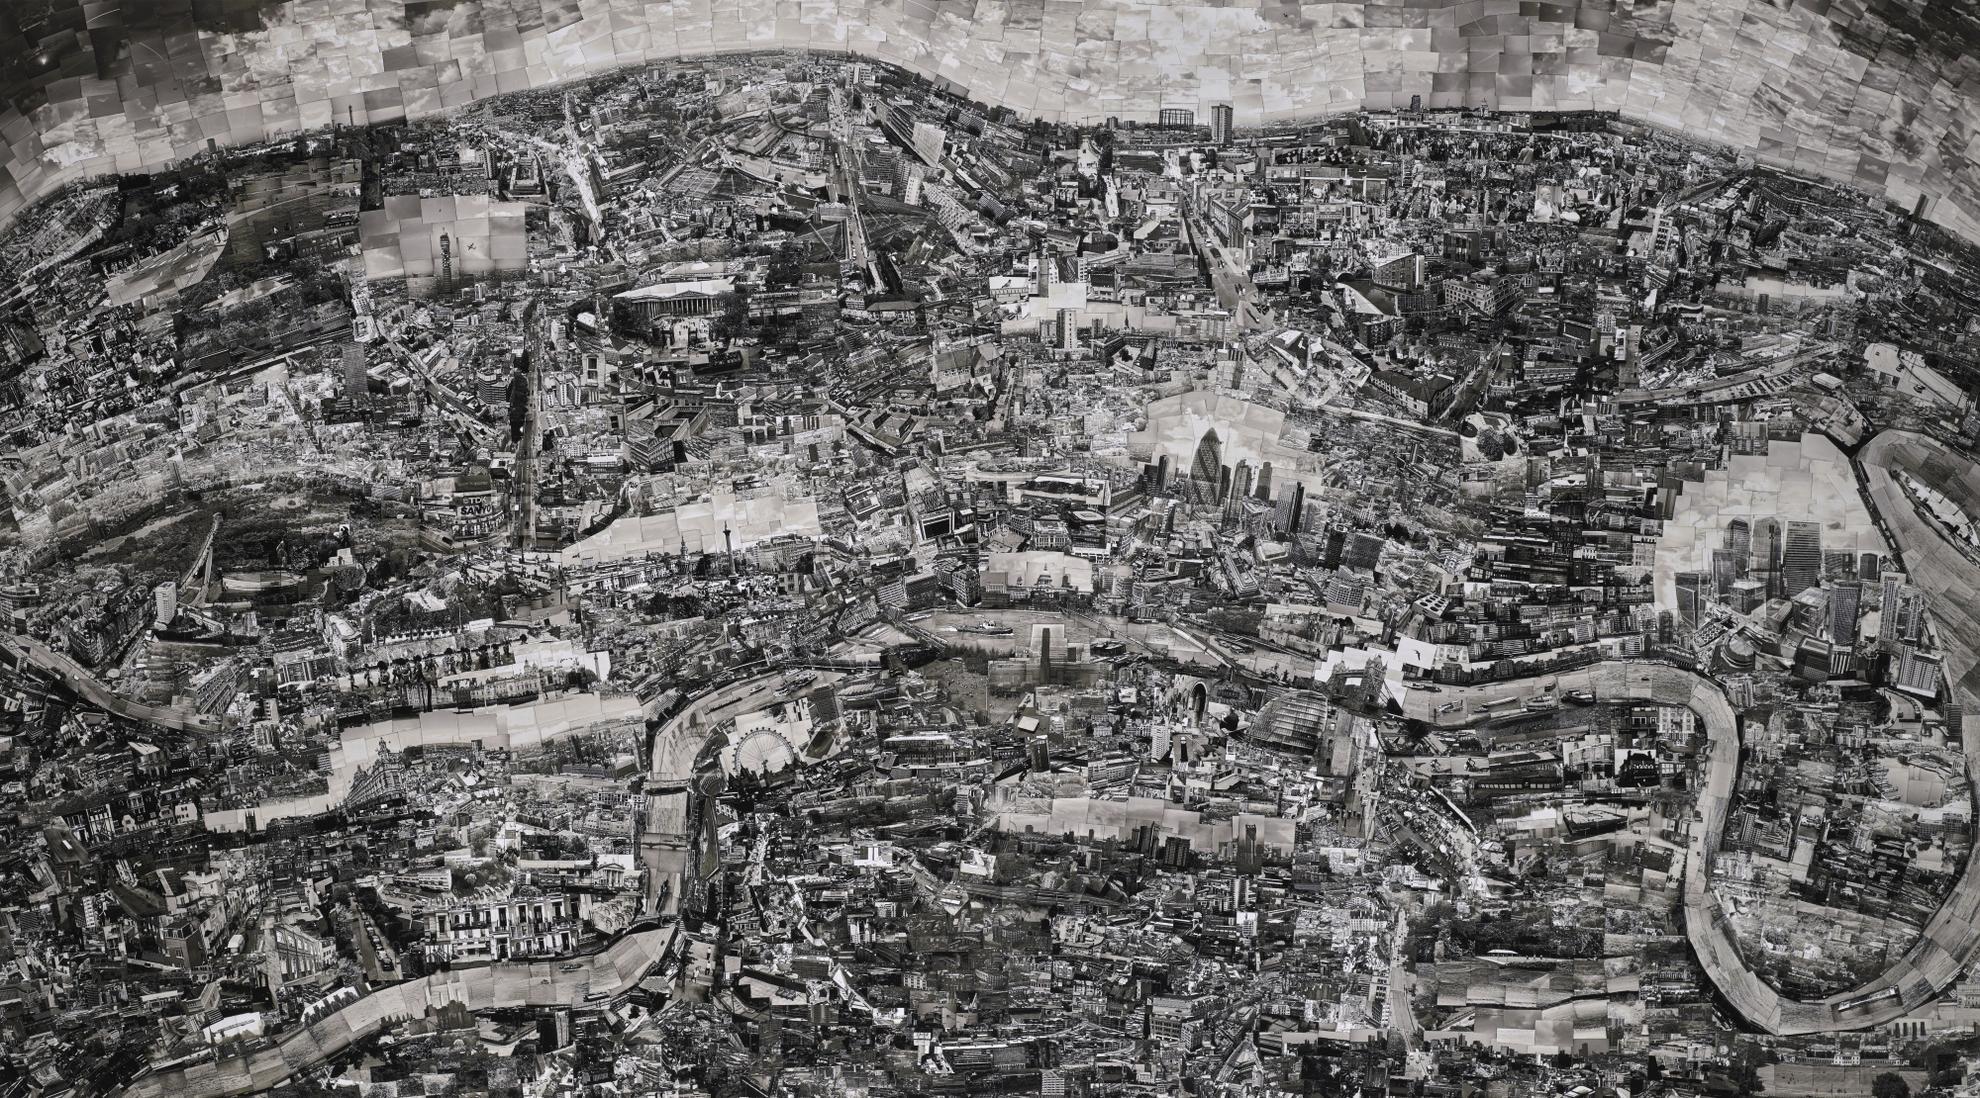 Sohei Nishino - Diorama Map, London, 2010-2010